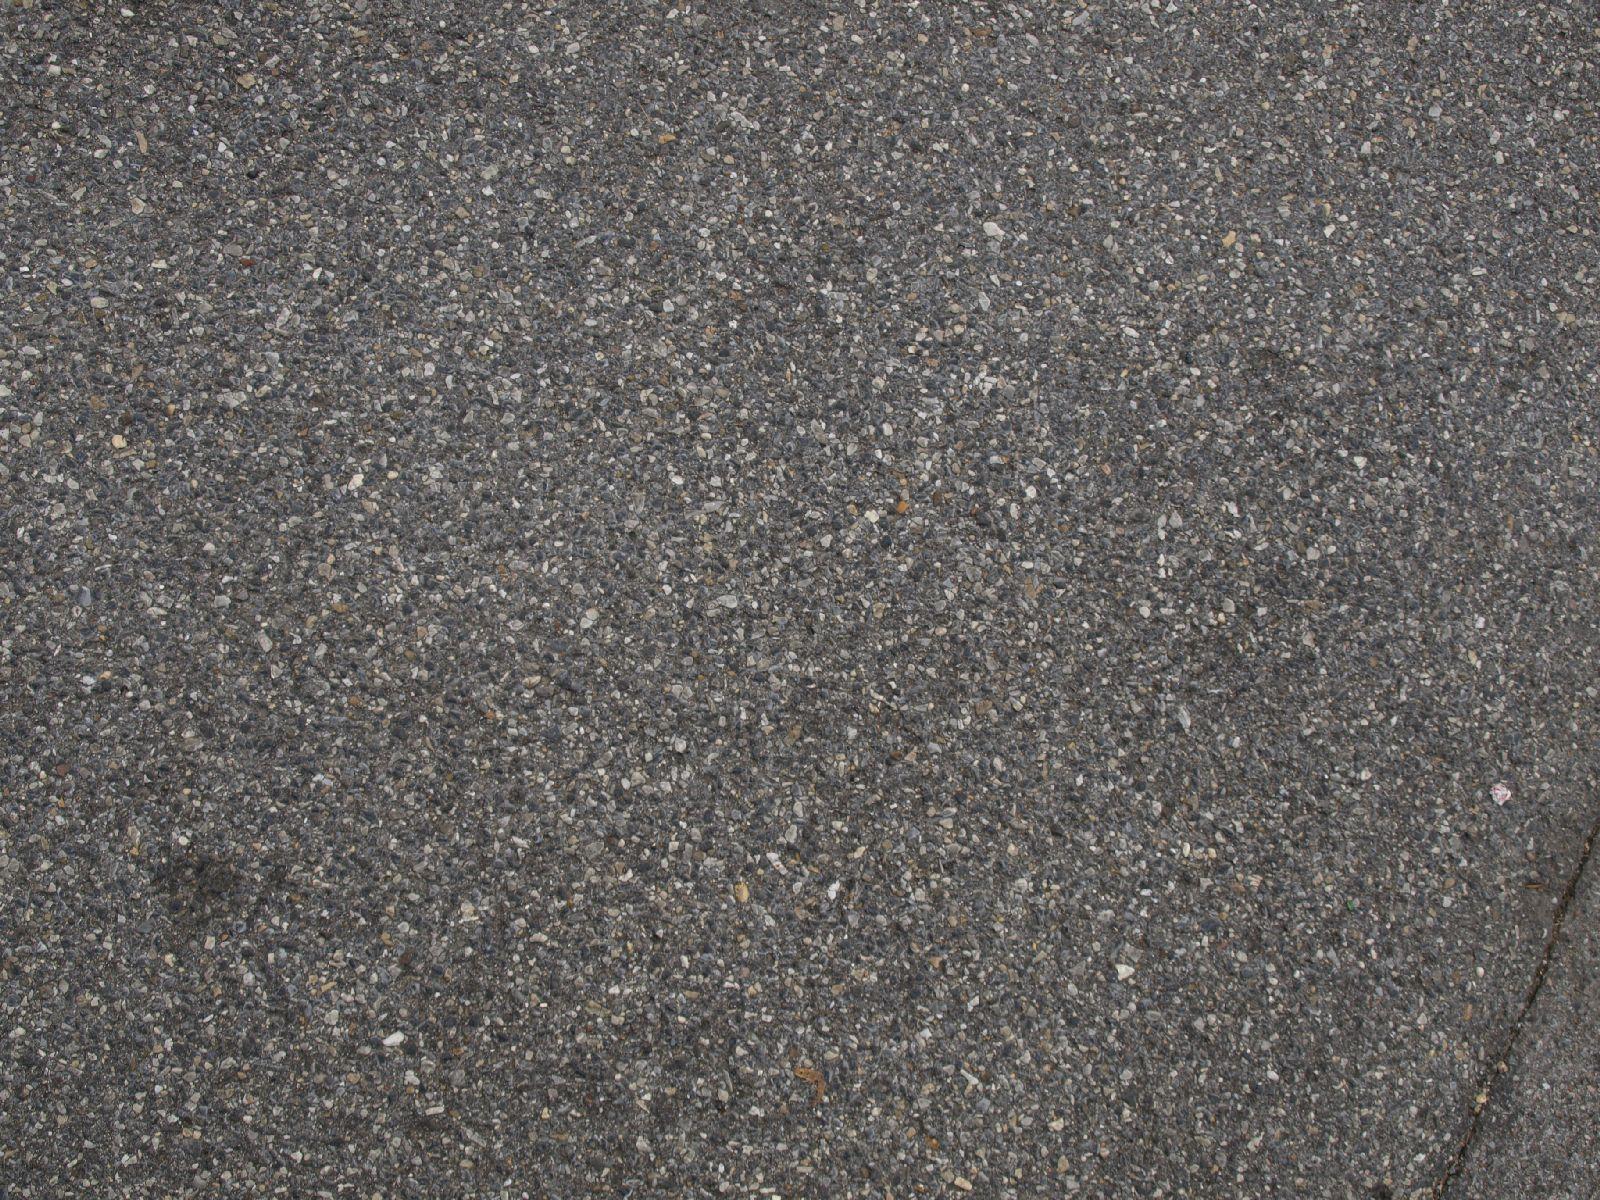 Ground-Urban_Texture_A_PA045691